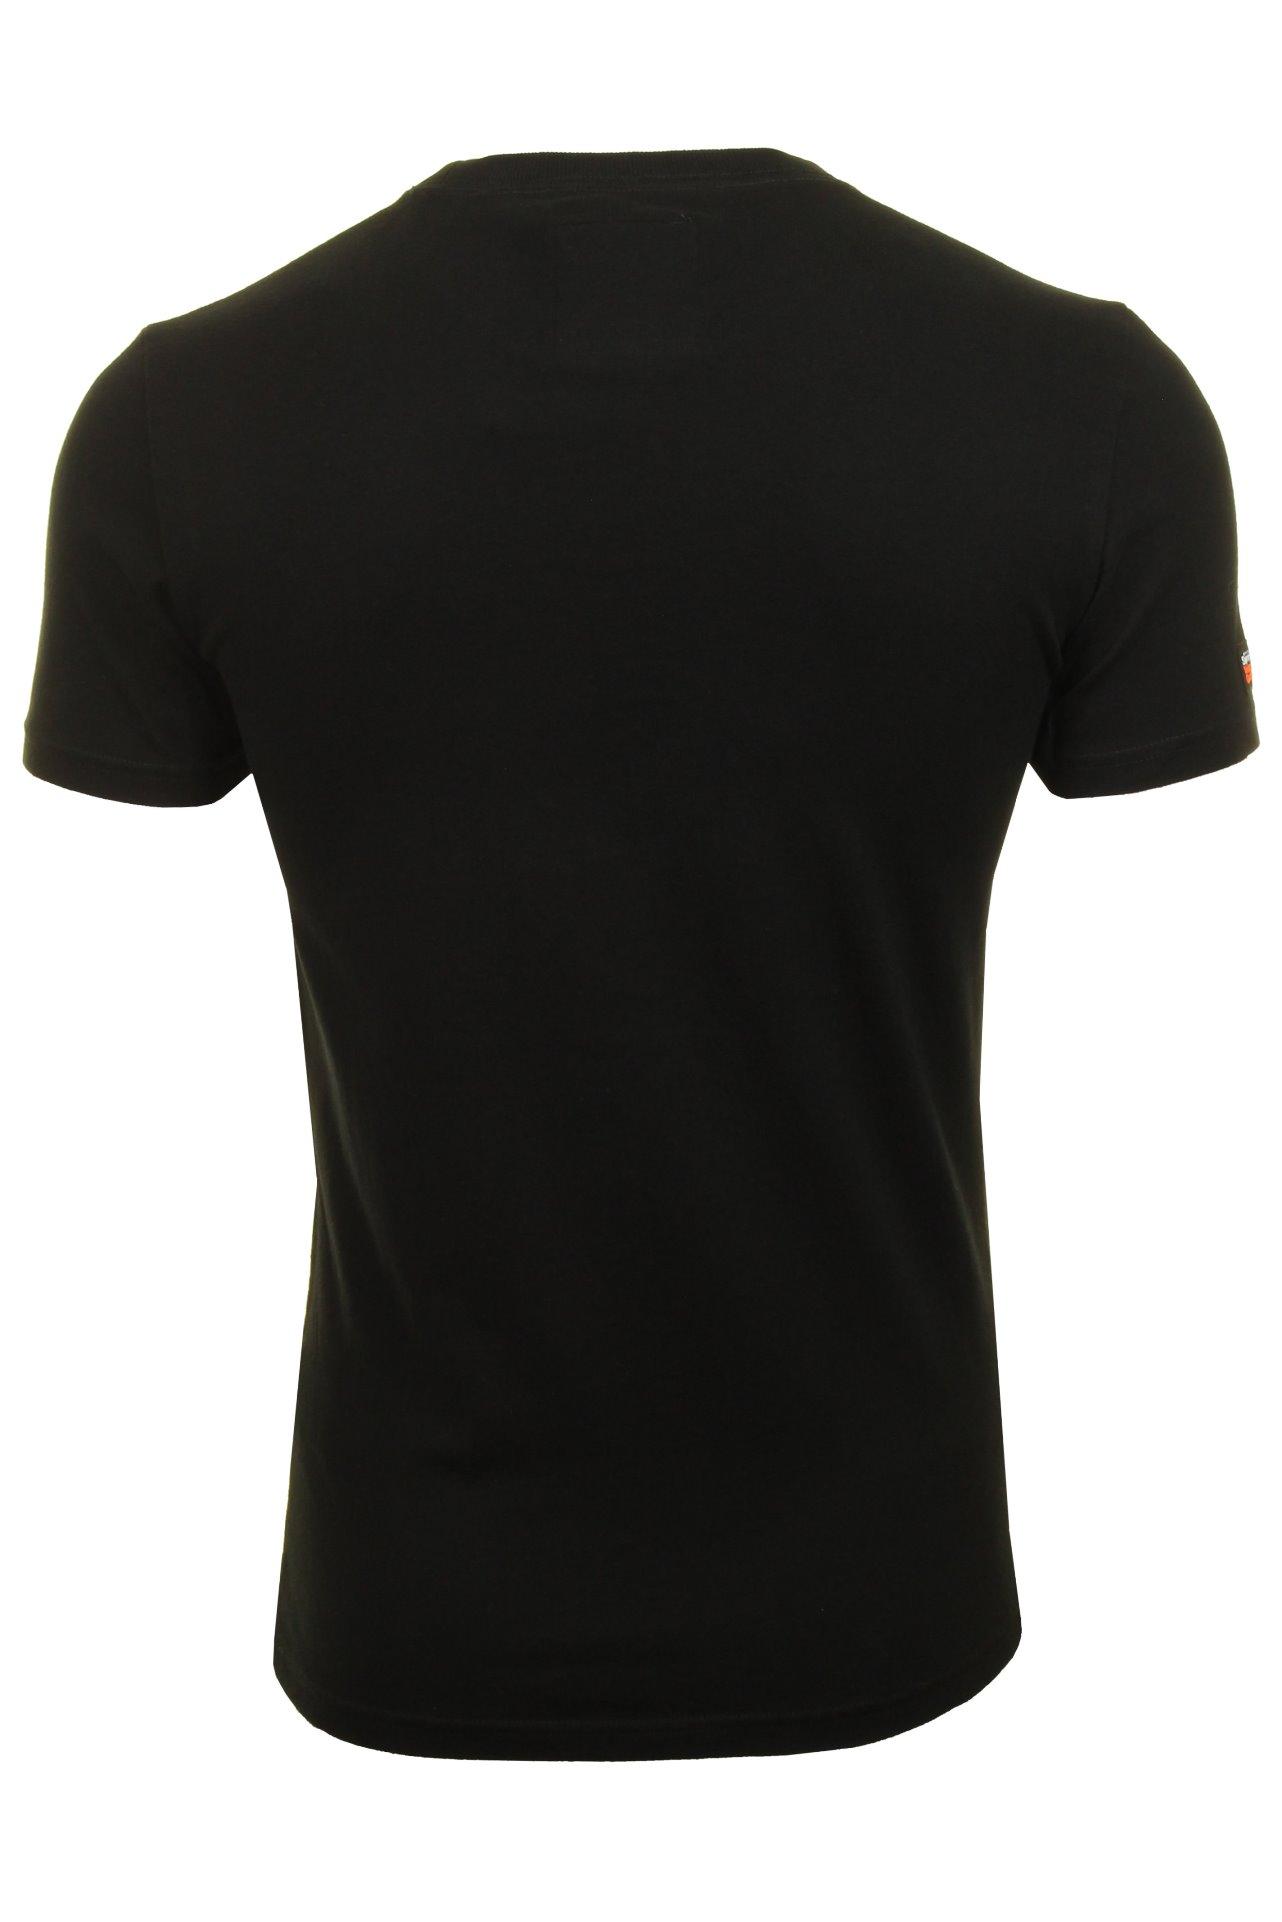 Superdry-039-Monochrome-039-Mens-T-Shirt thumbnail 5